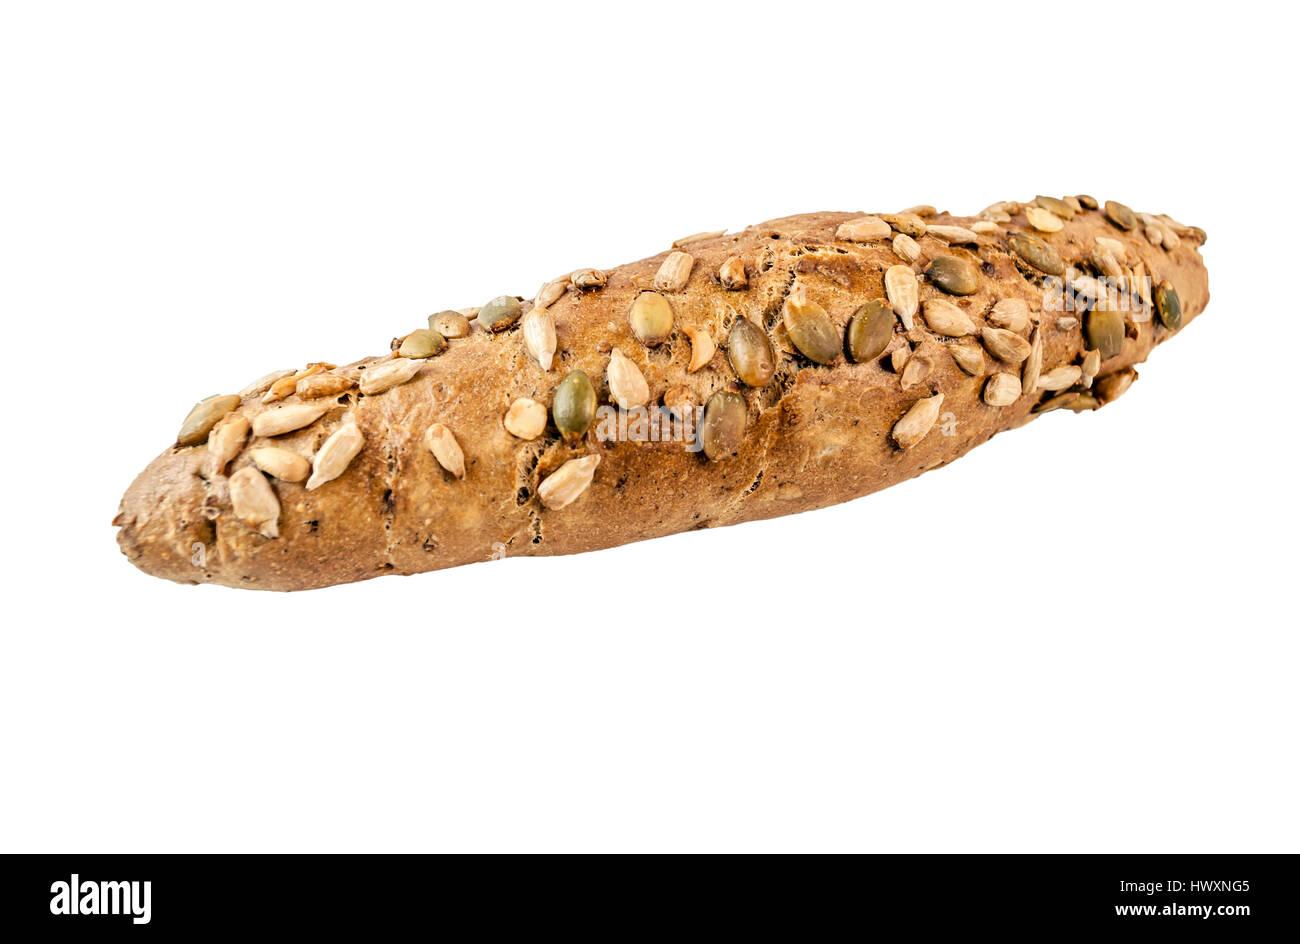 Freshly baked dietary bread roll - Stock Image